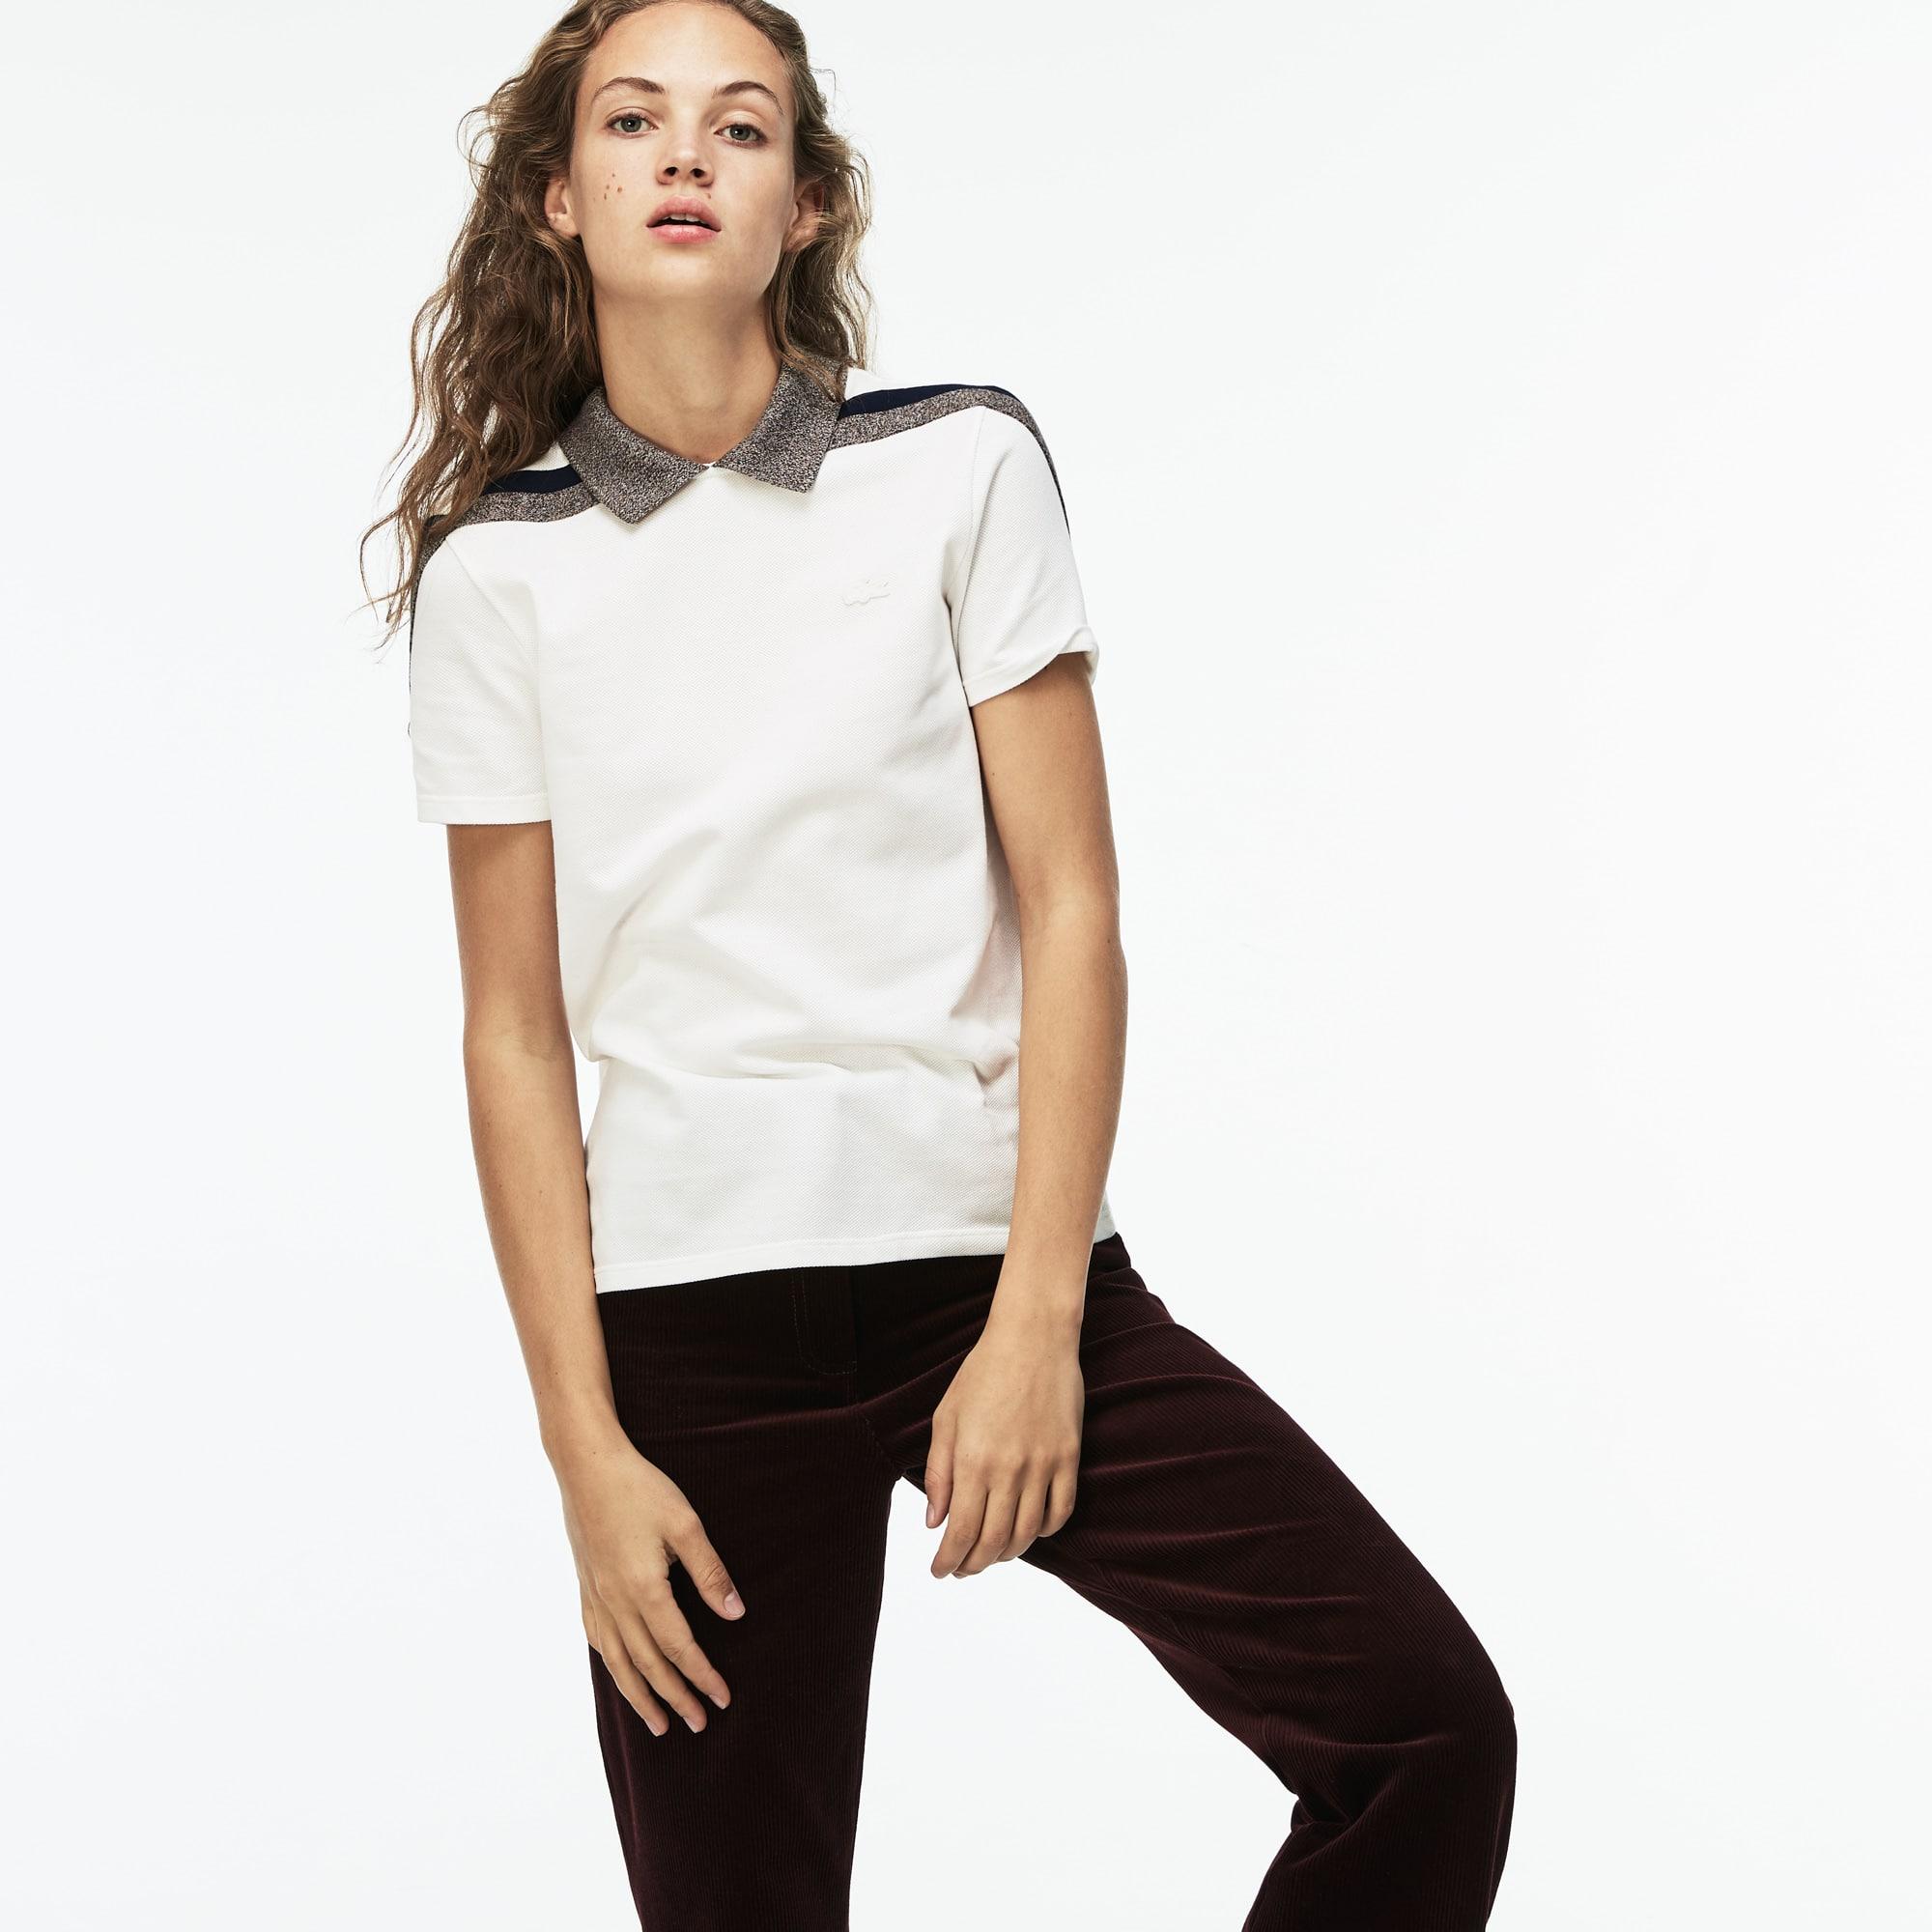 613cd5170879d Camisas polo para mulheres  manga longa e sem manga